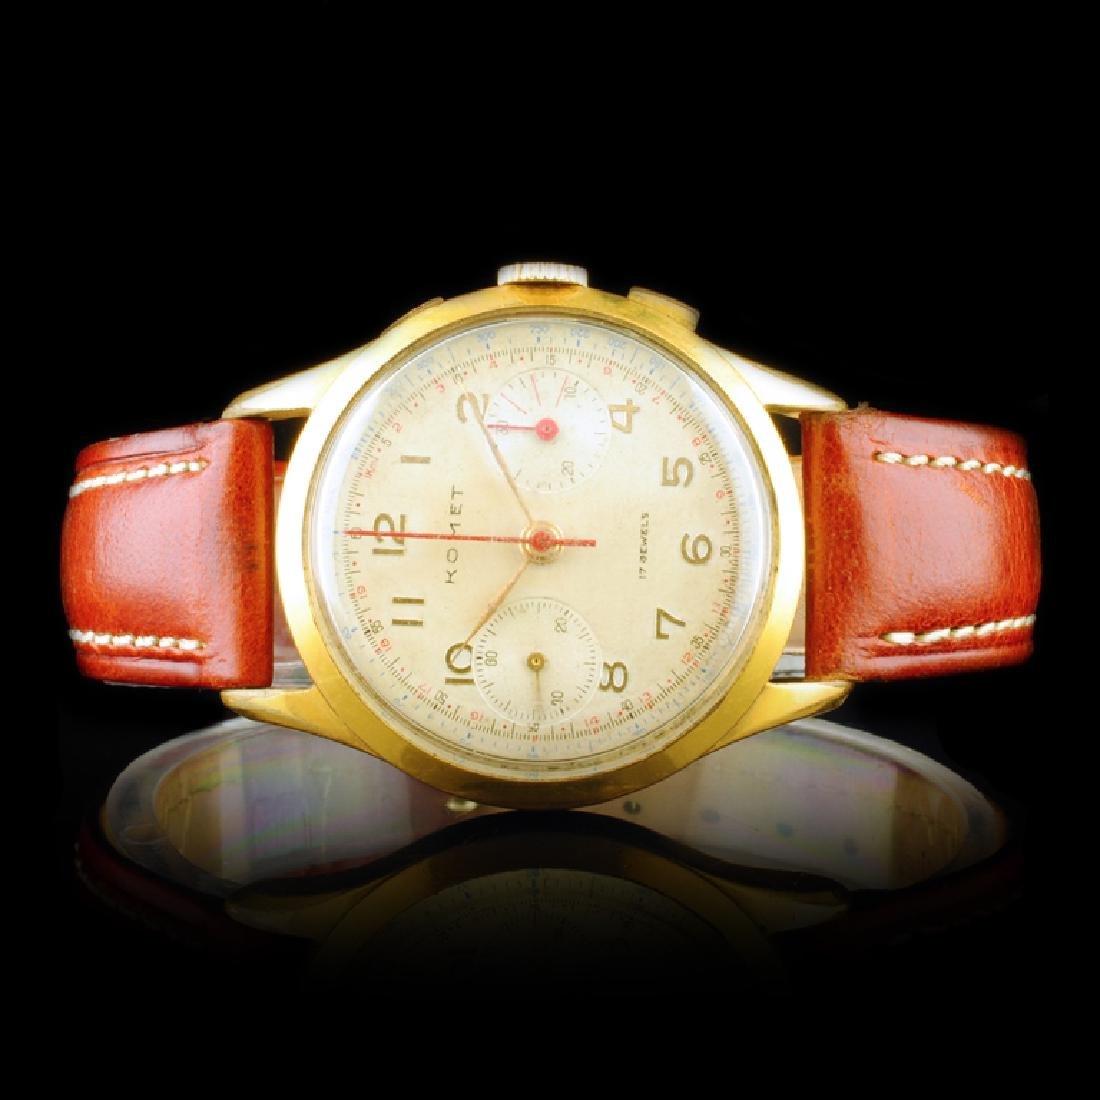 Komet Swiss 17-Jewel Chronograph 36mm Watch